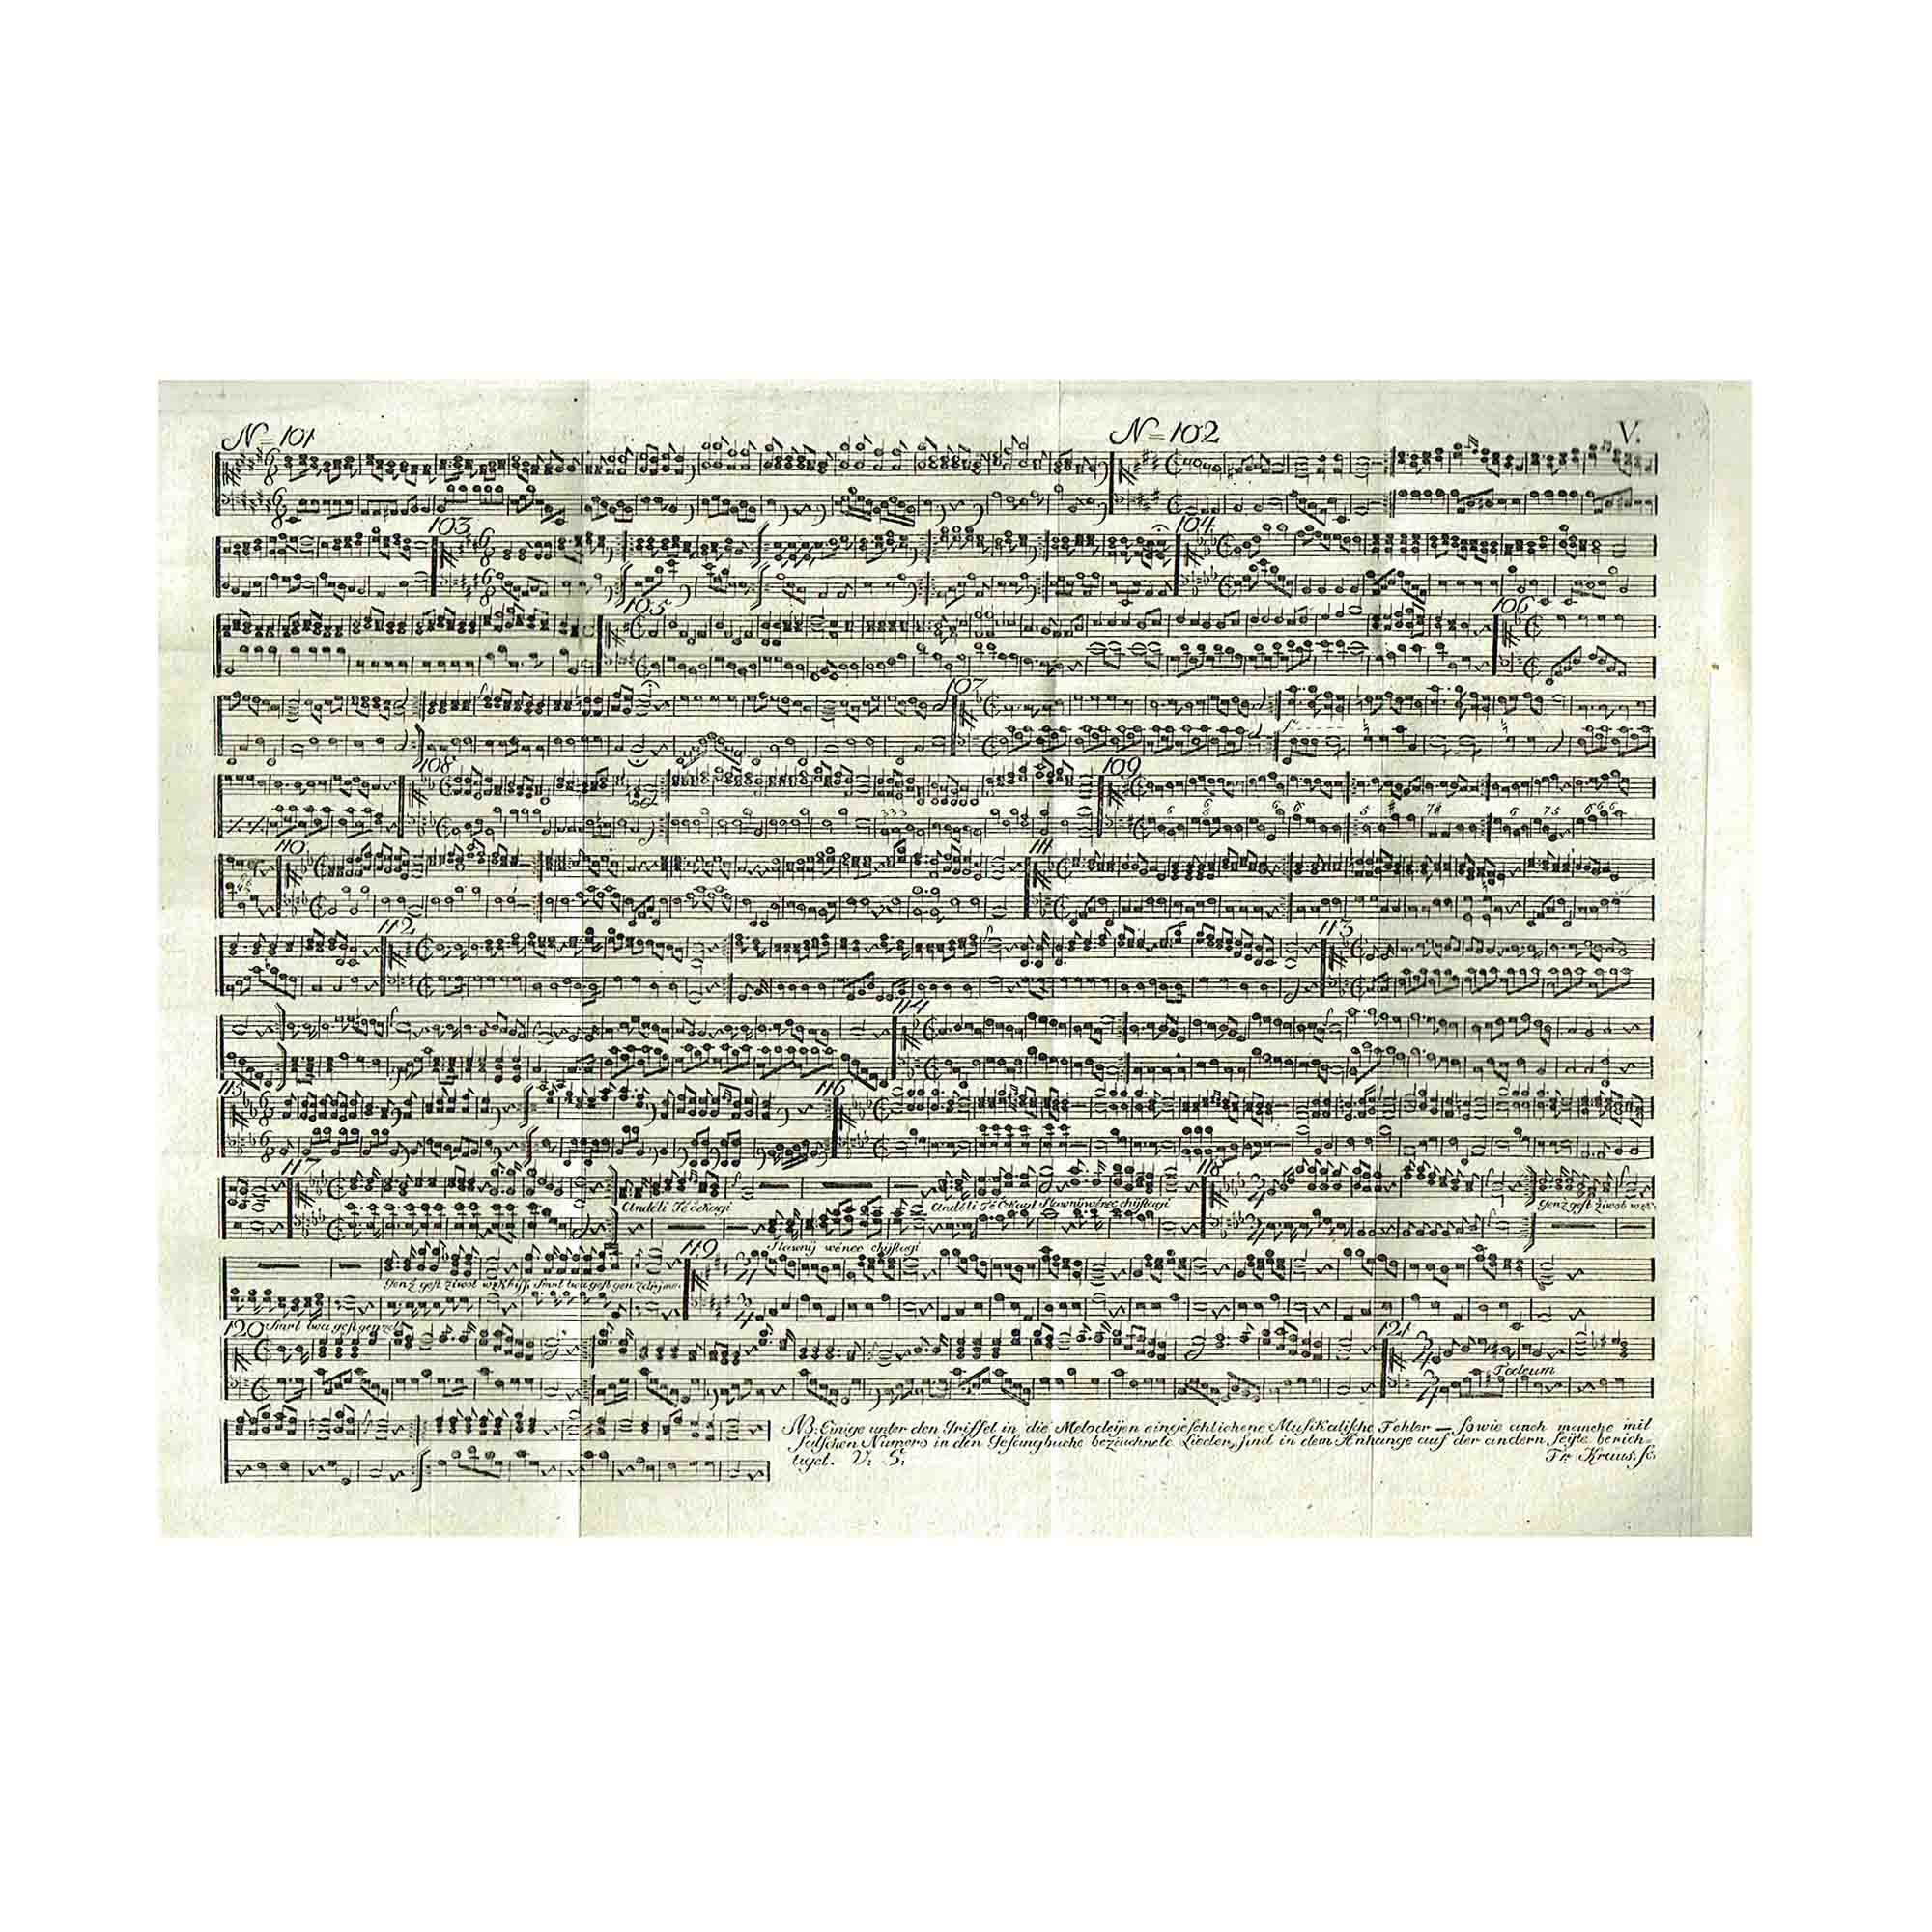 5404-Frycaj-Katolicky-kancyonal-1809-Noten-N.jpg